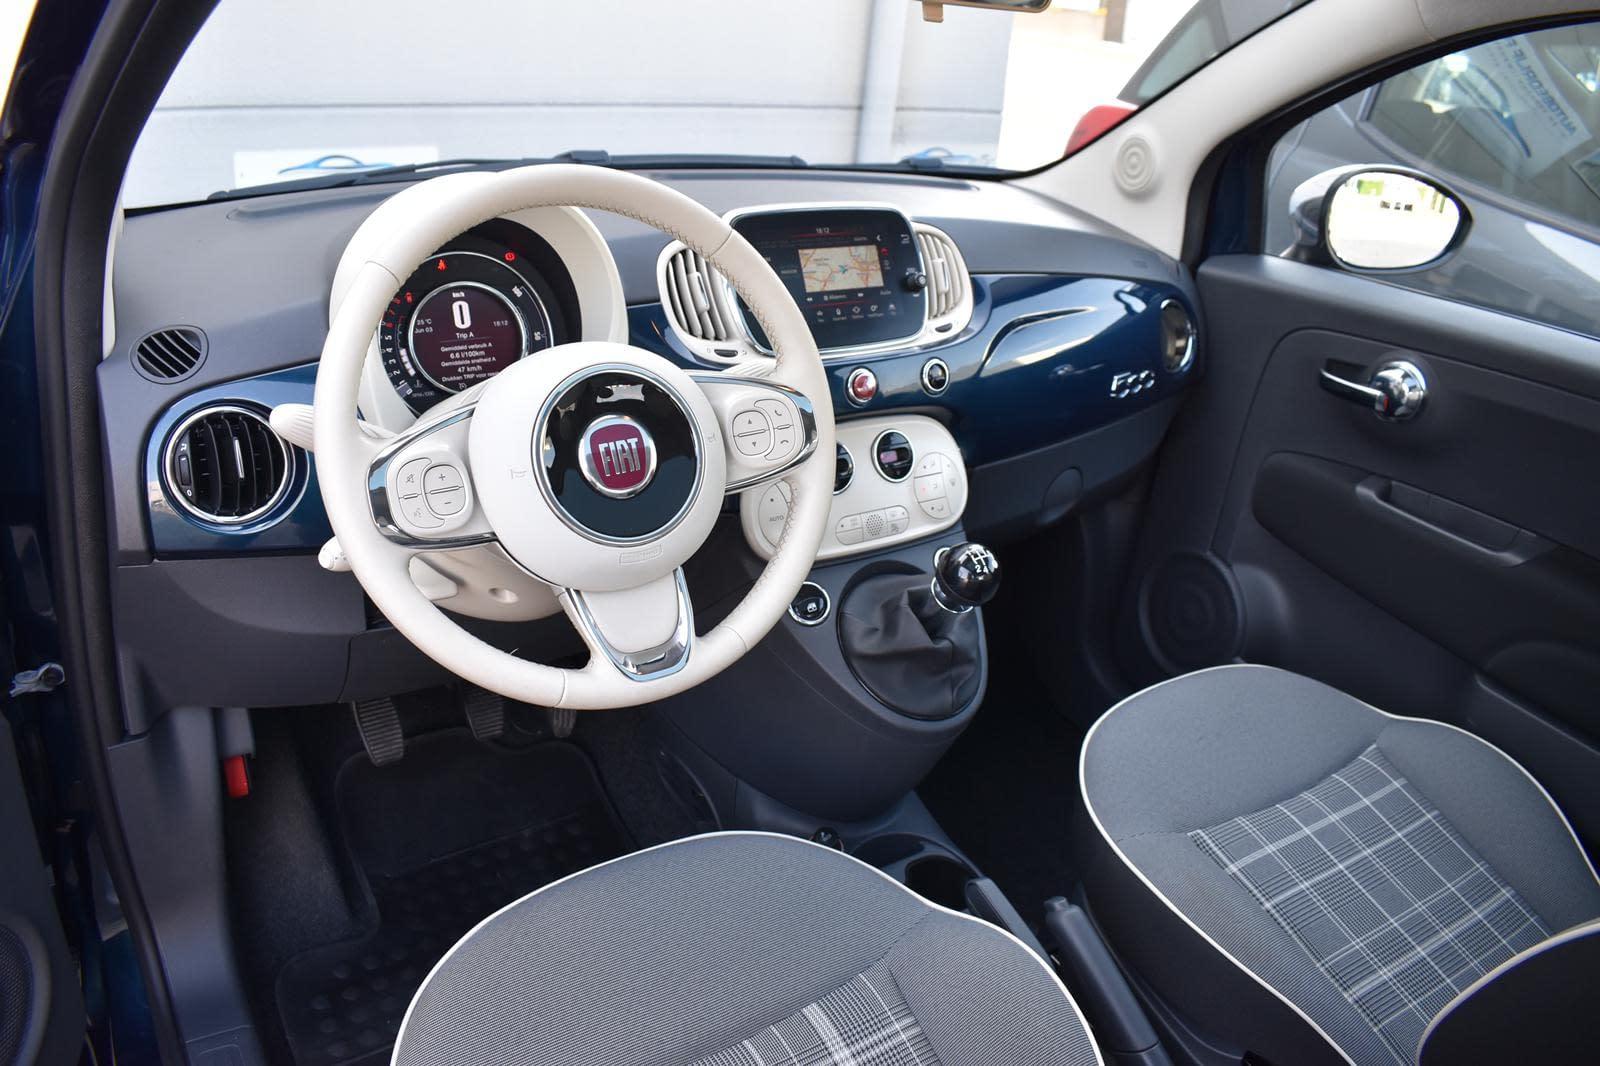 Fiat 500 C 1.2 Lounge